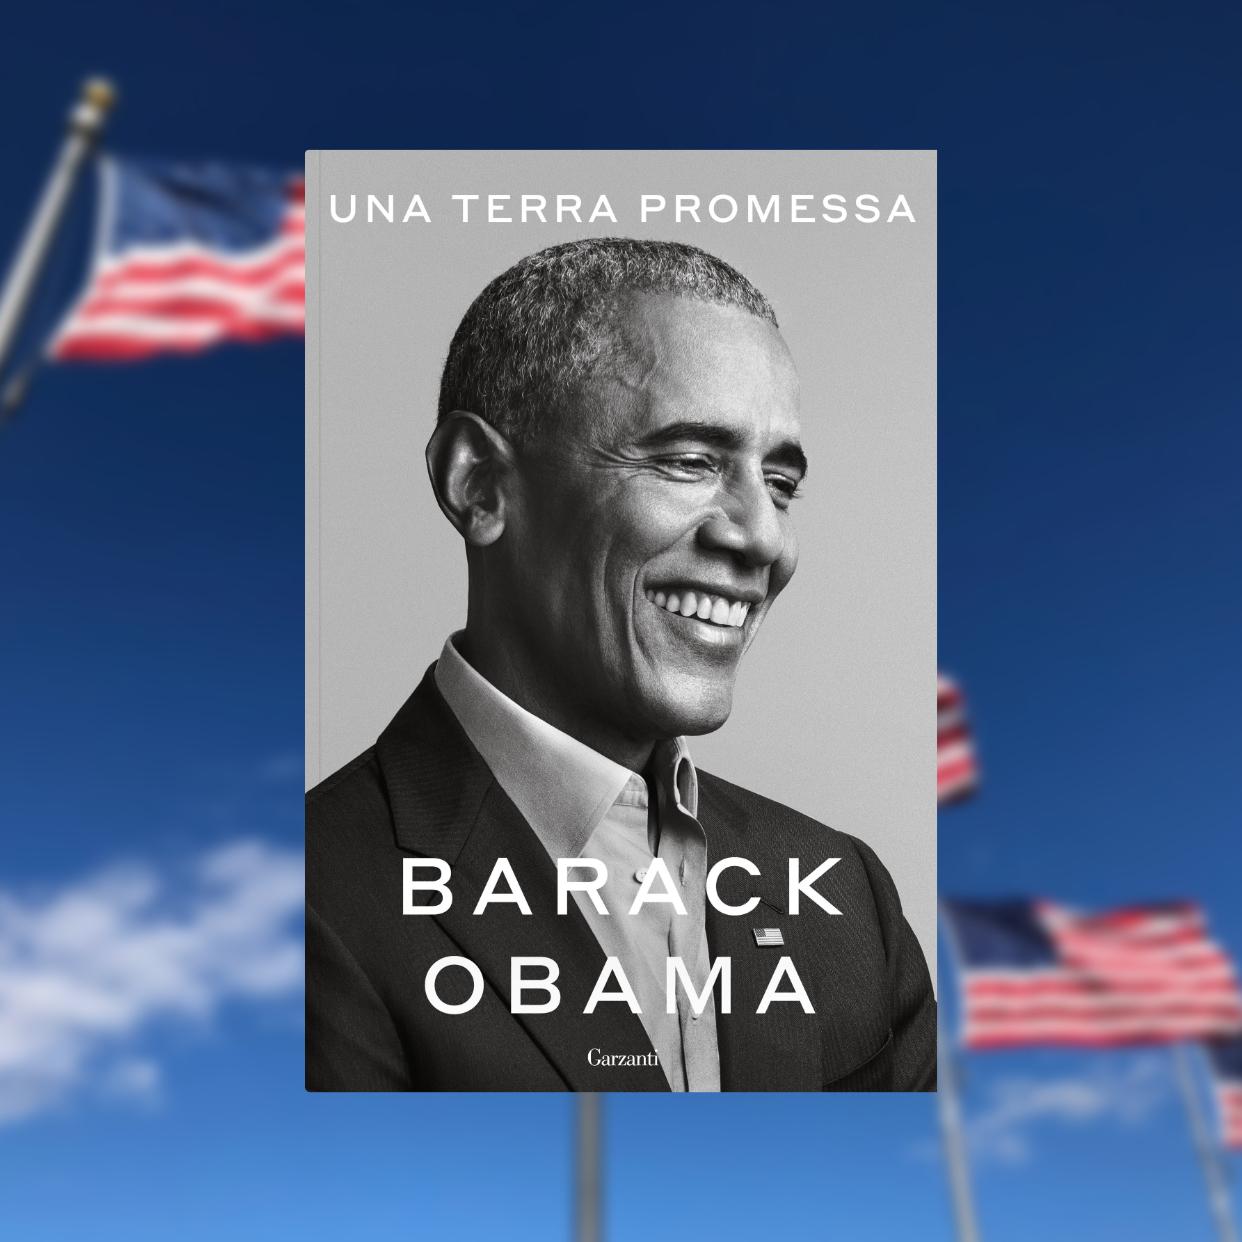 Barack Obama si racconta: Una terra promessa